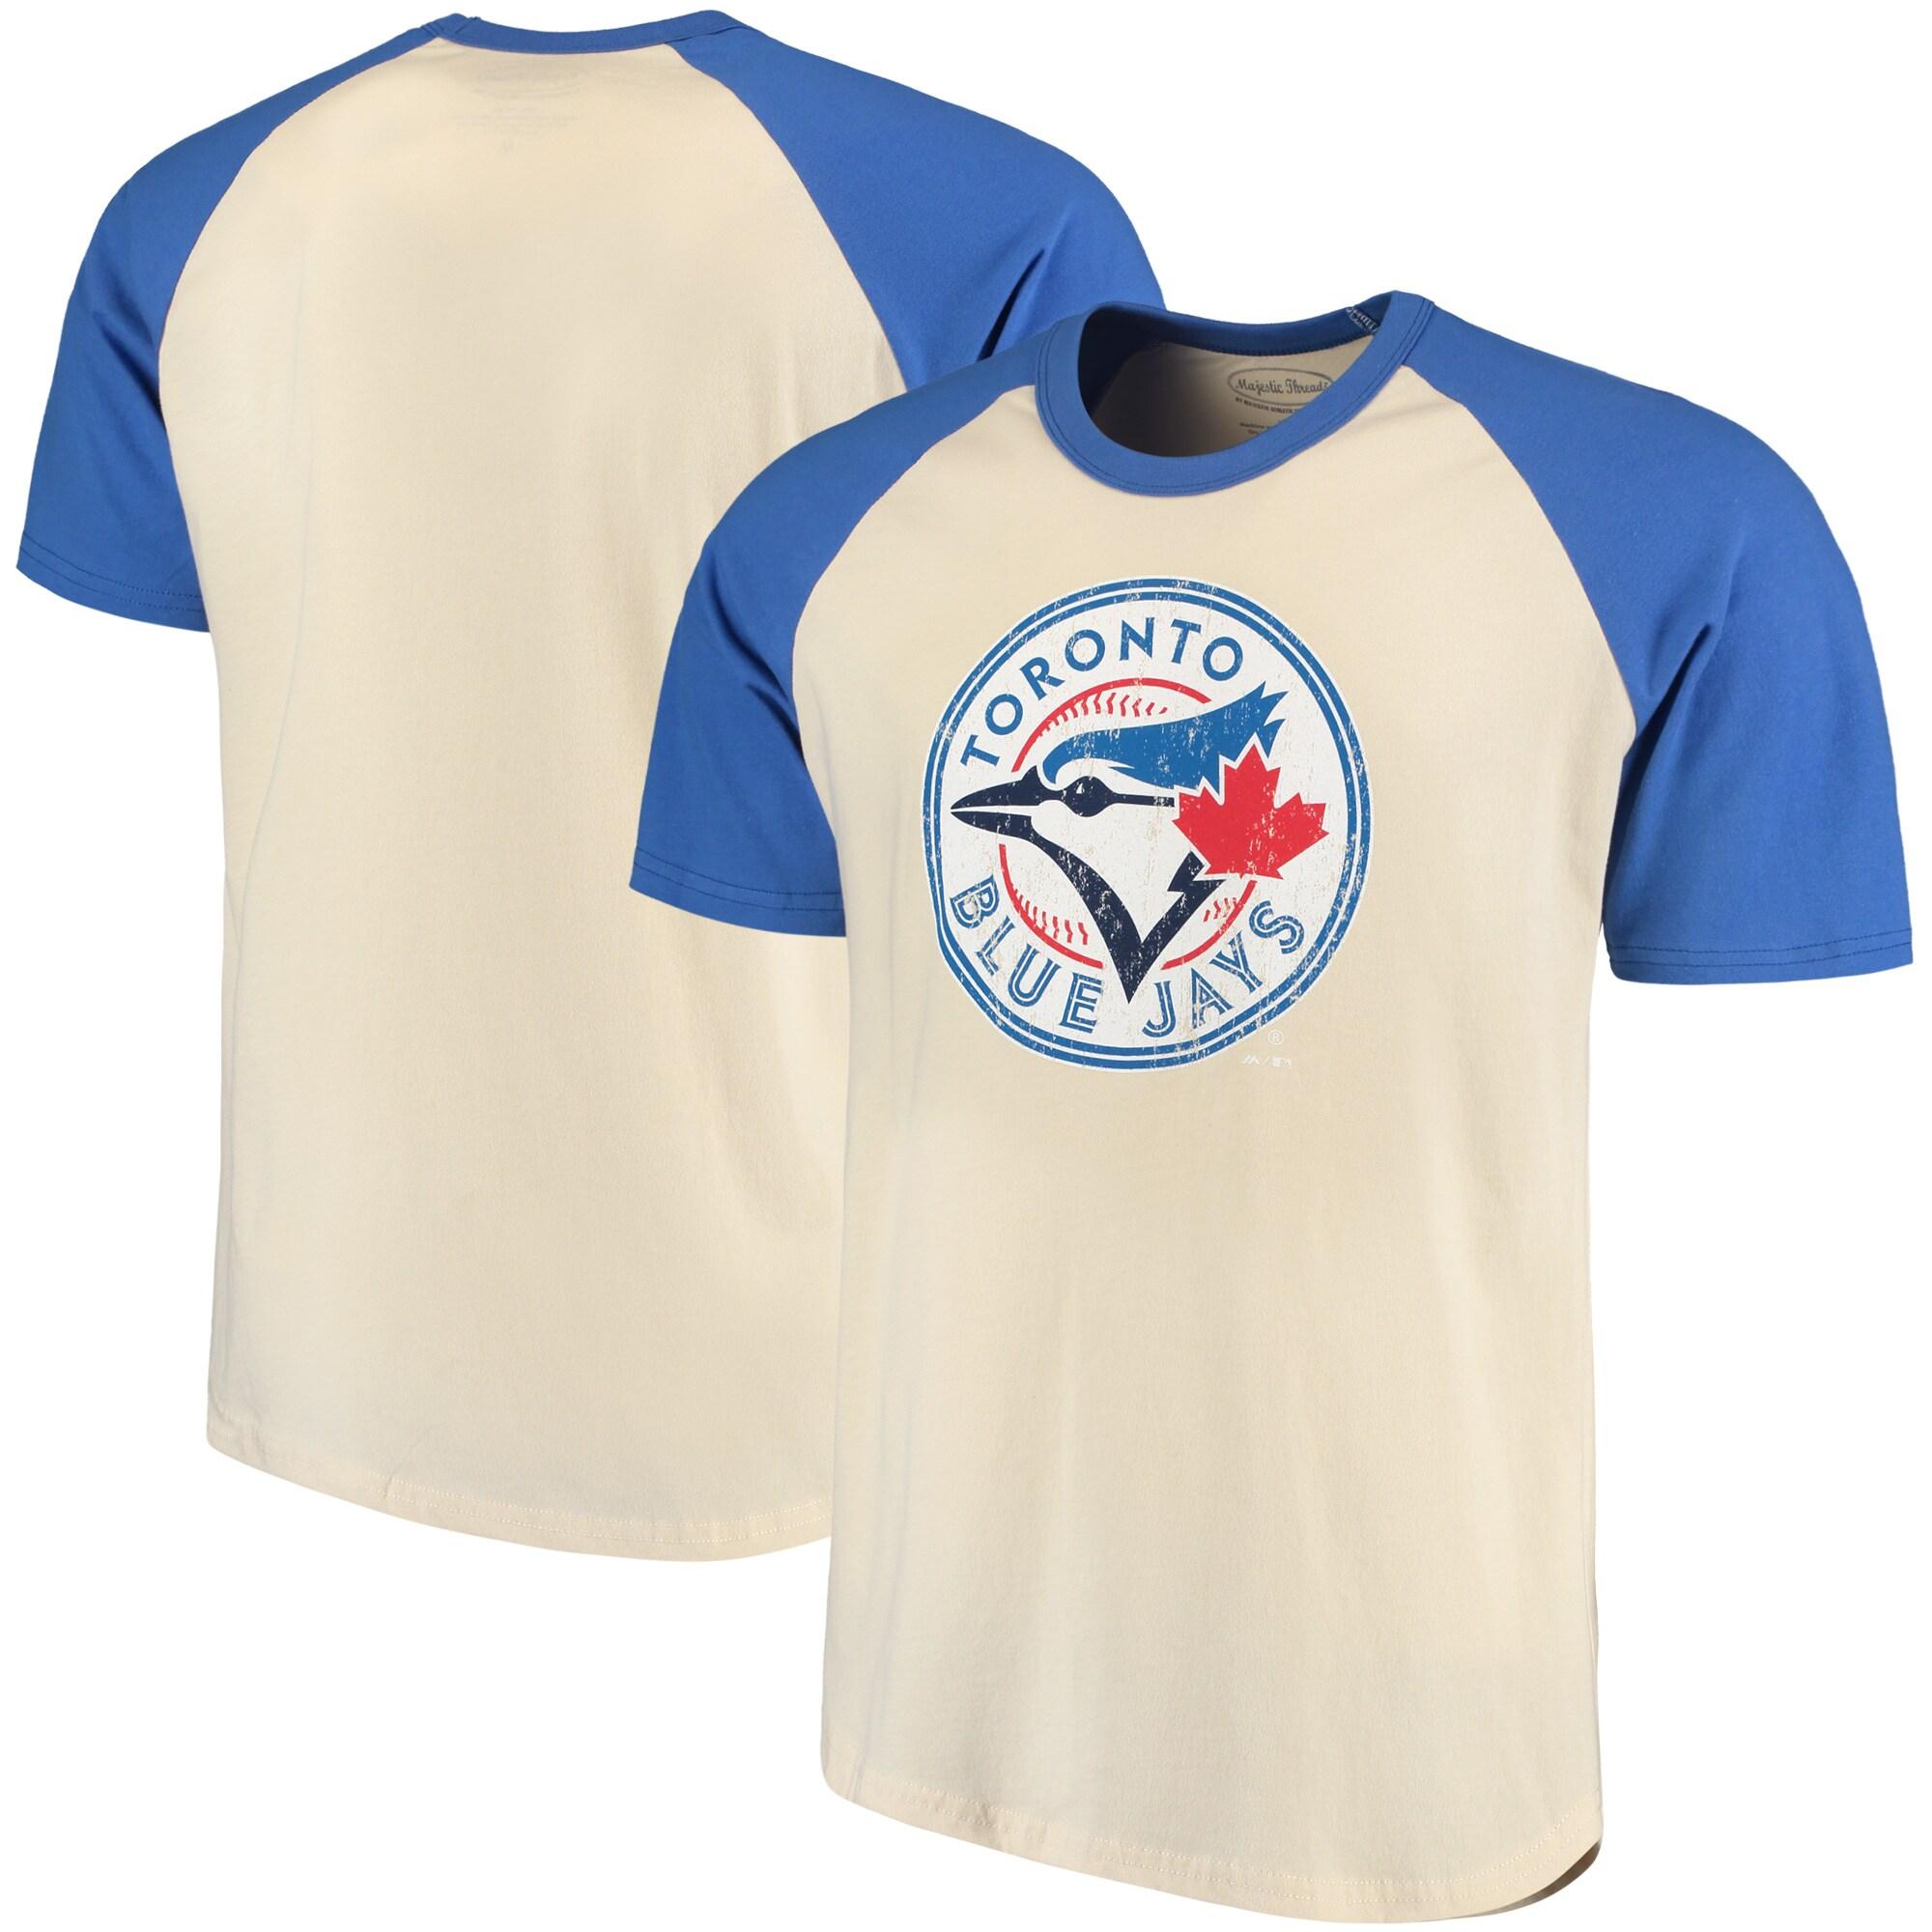 Toronto Blue Jays Majestic Threads Softhand Raglan T-Shirt - Cream/Royal